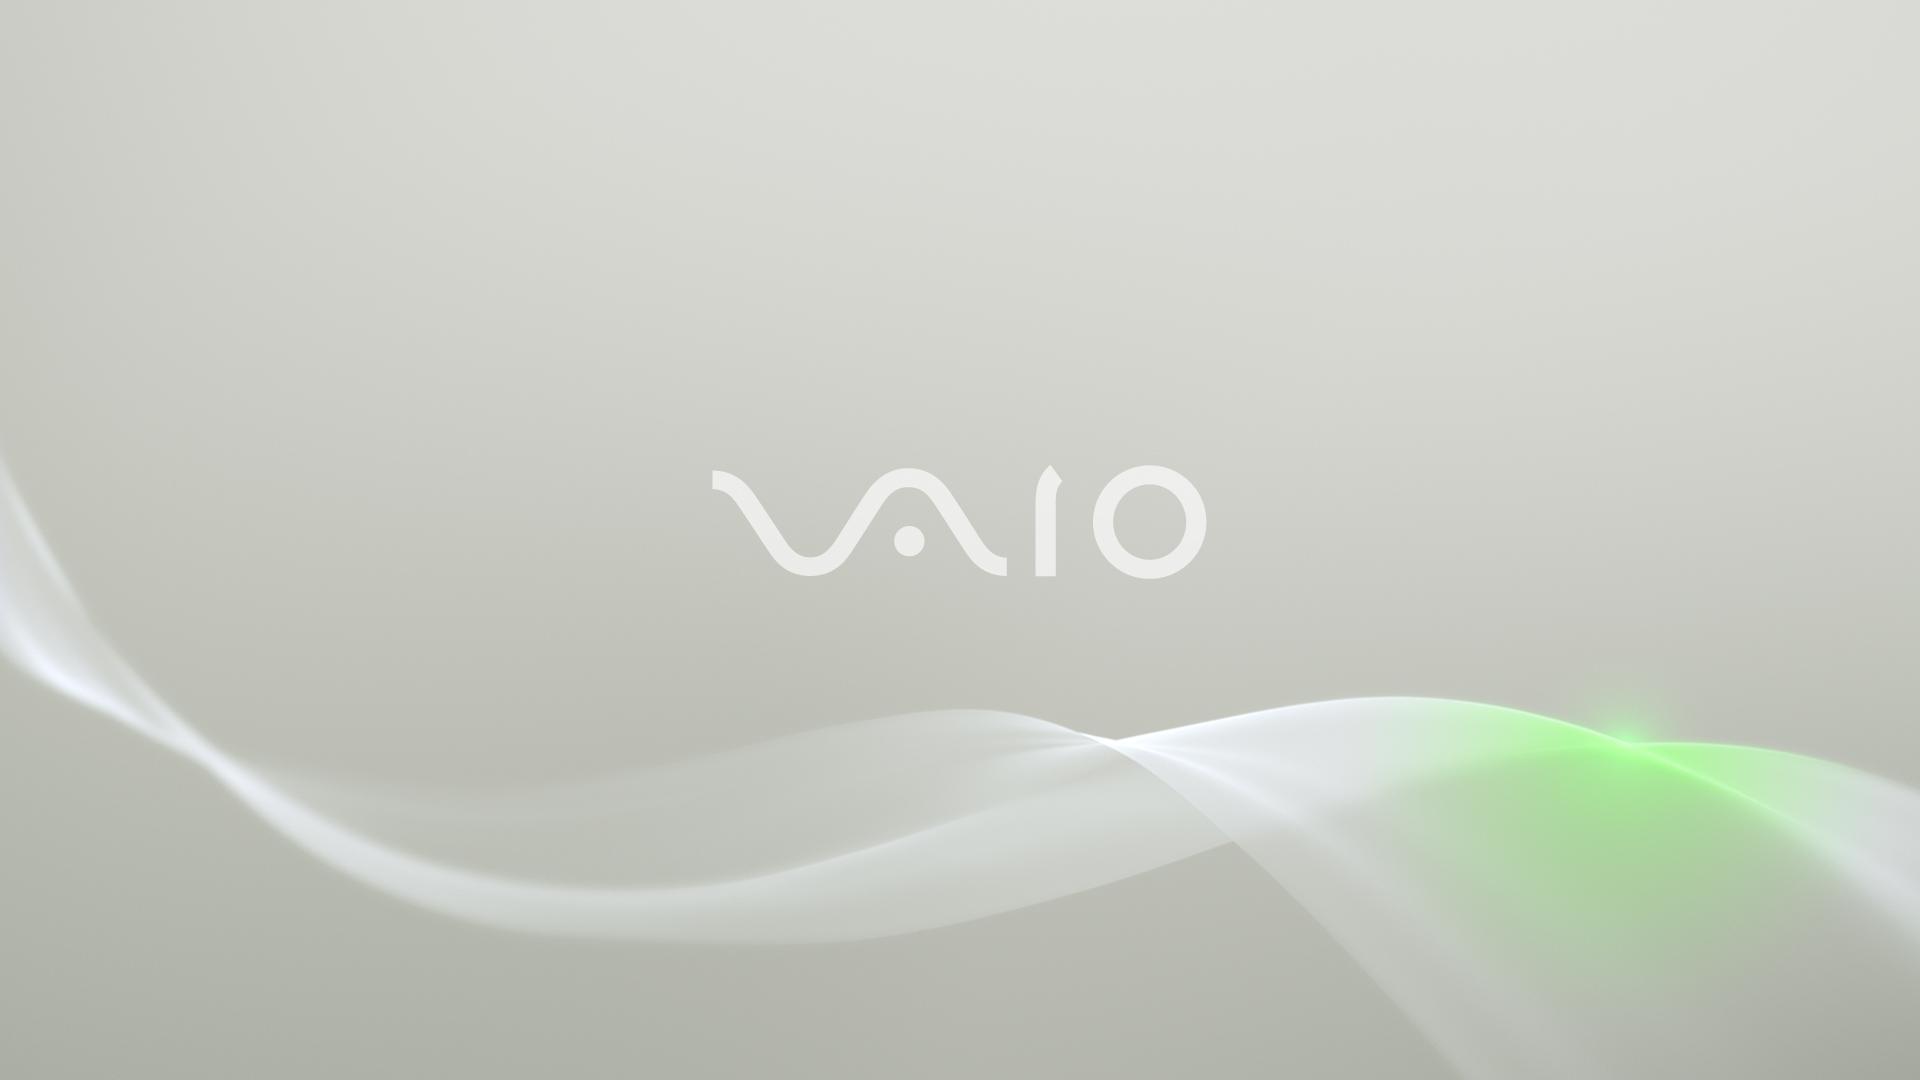 HD Sony Vaio Wallpapers & Vaio ...